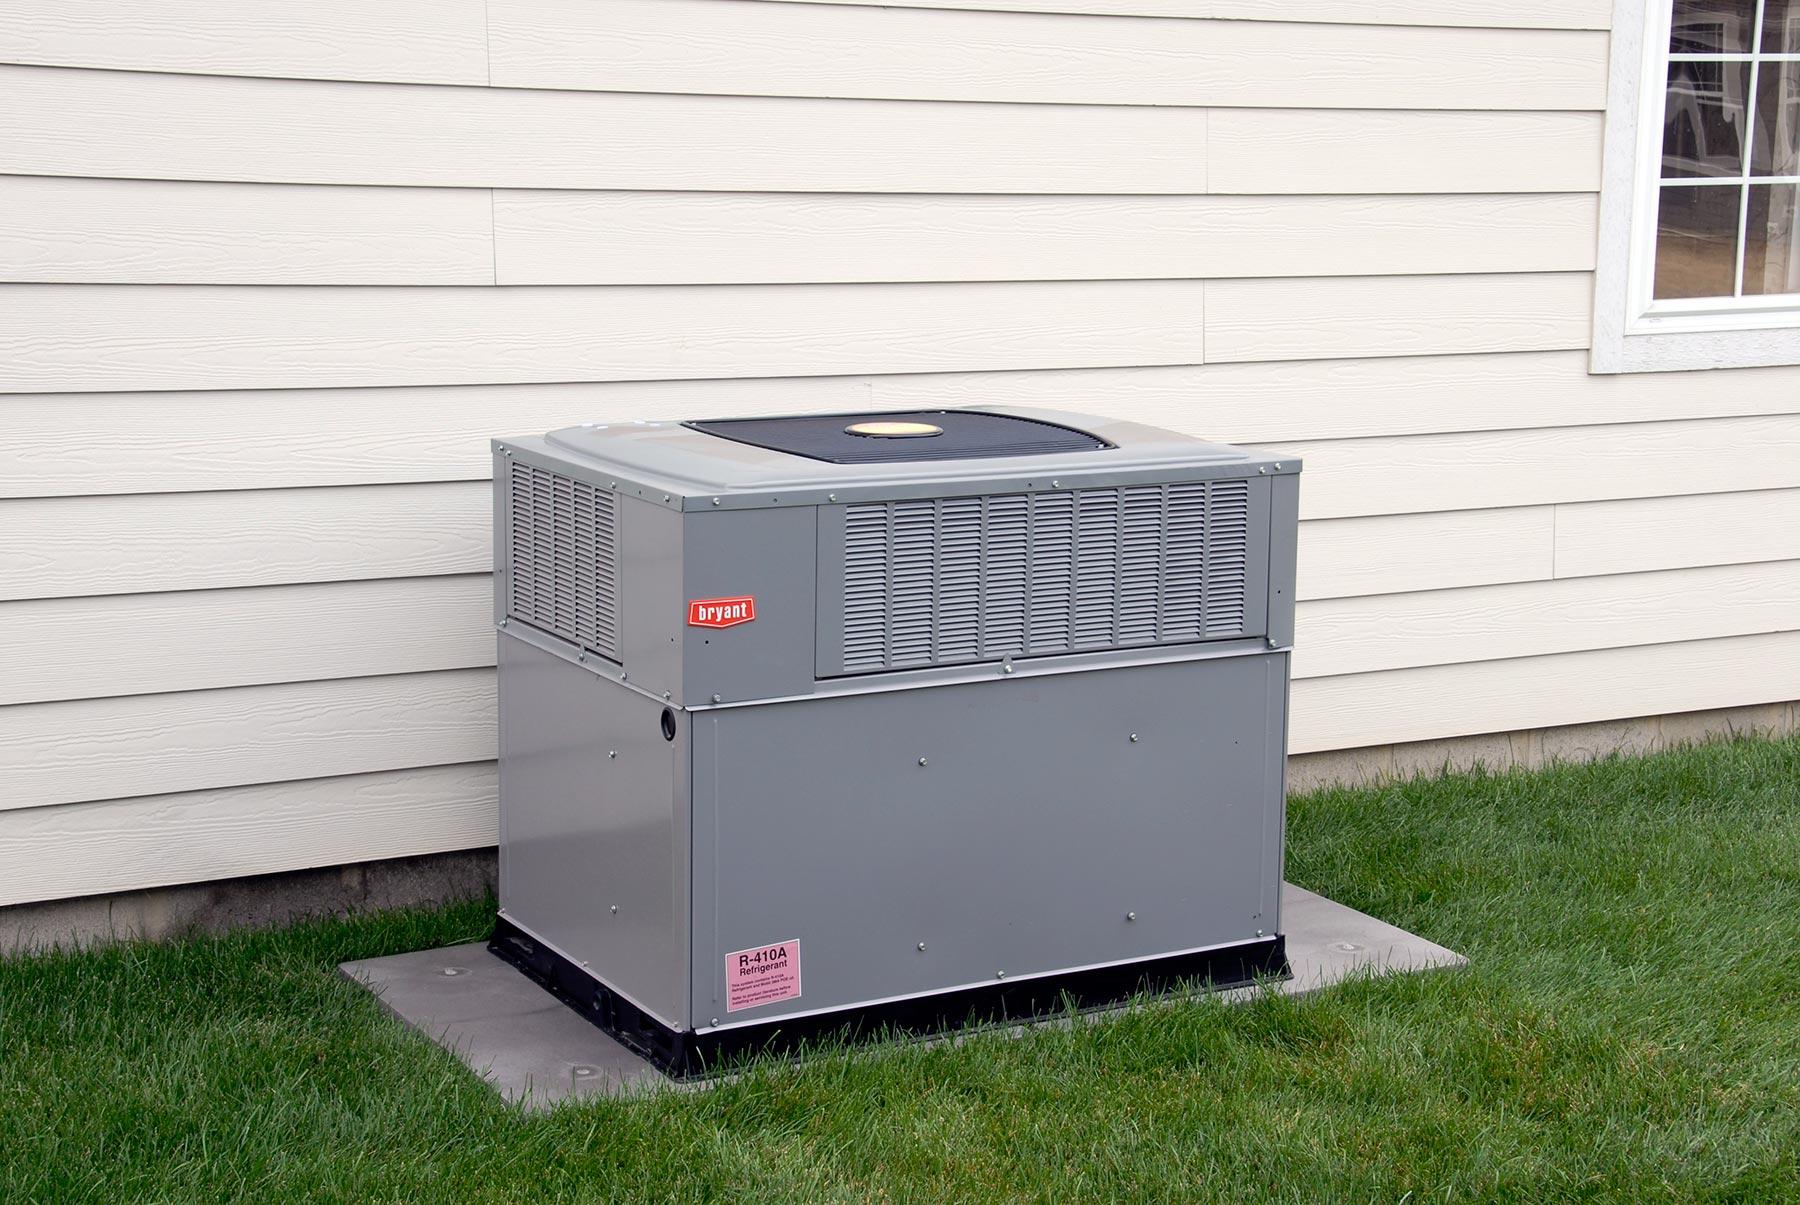 Packaged air conditioning Casa Grande, AZ